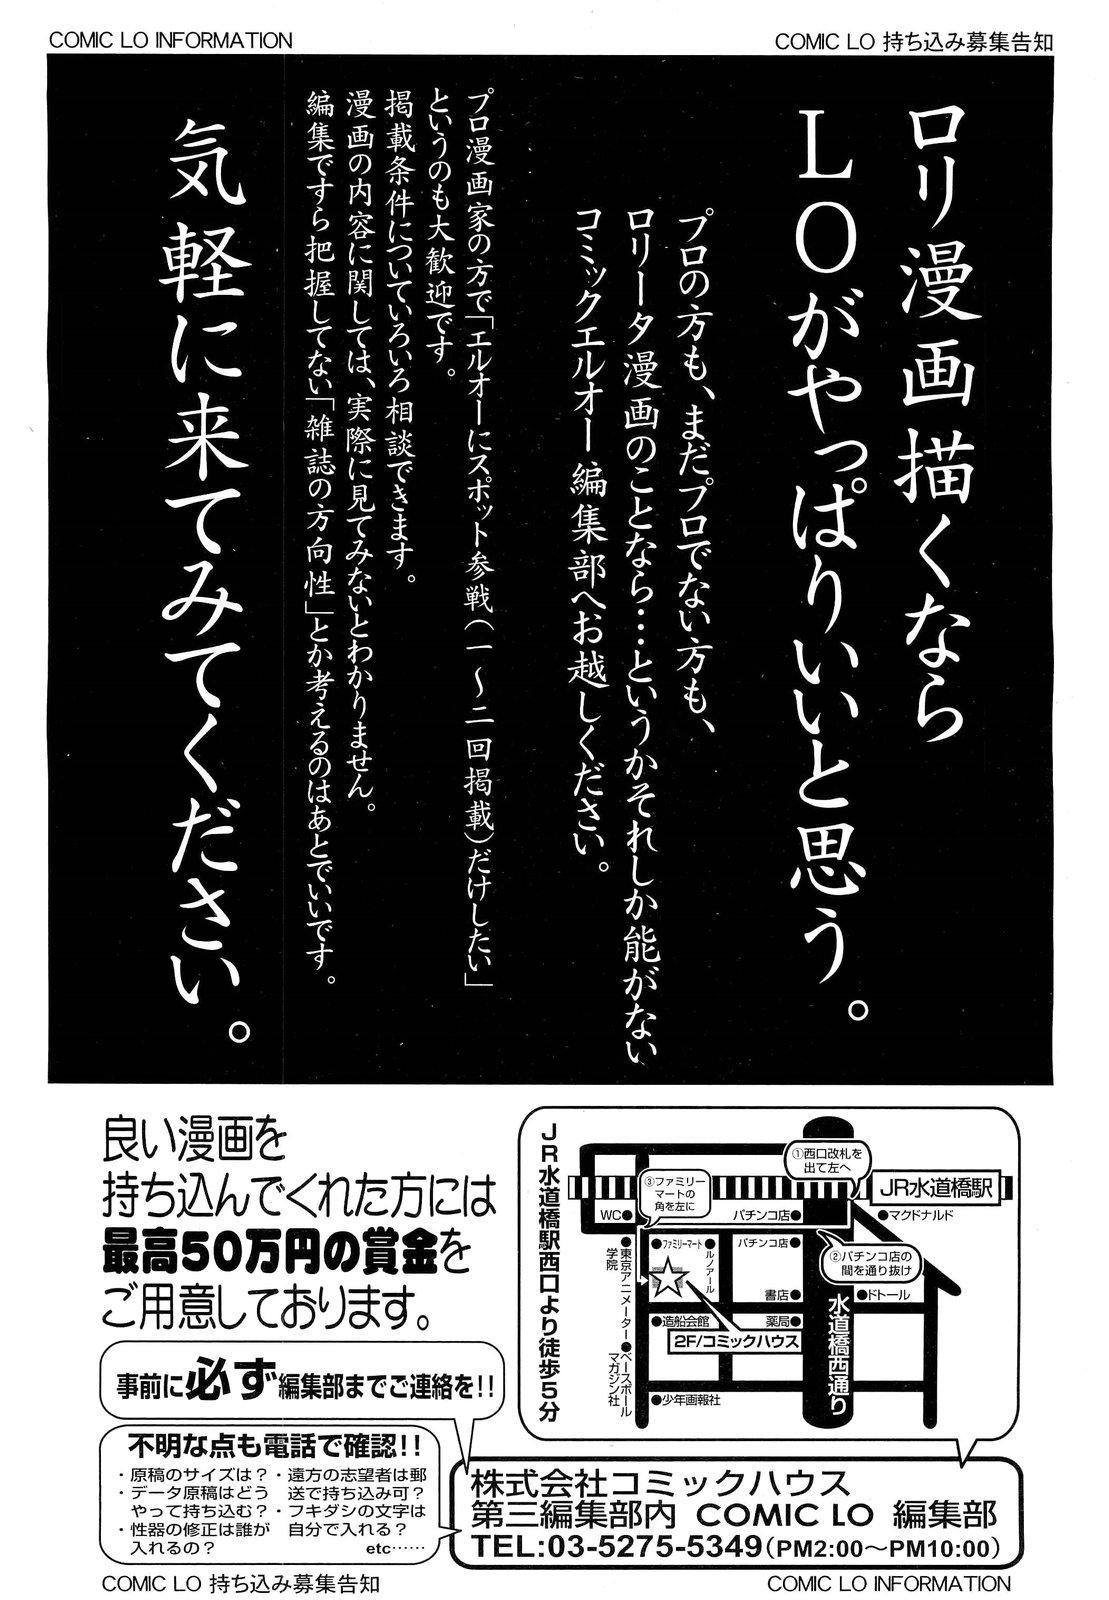 COMIC LO 2012-05 Vol. 98 439